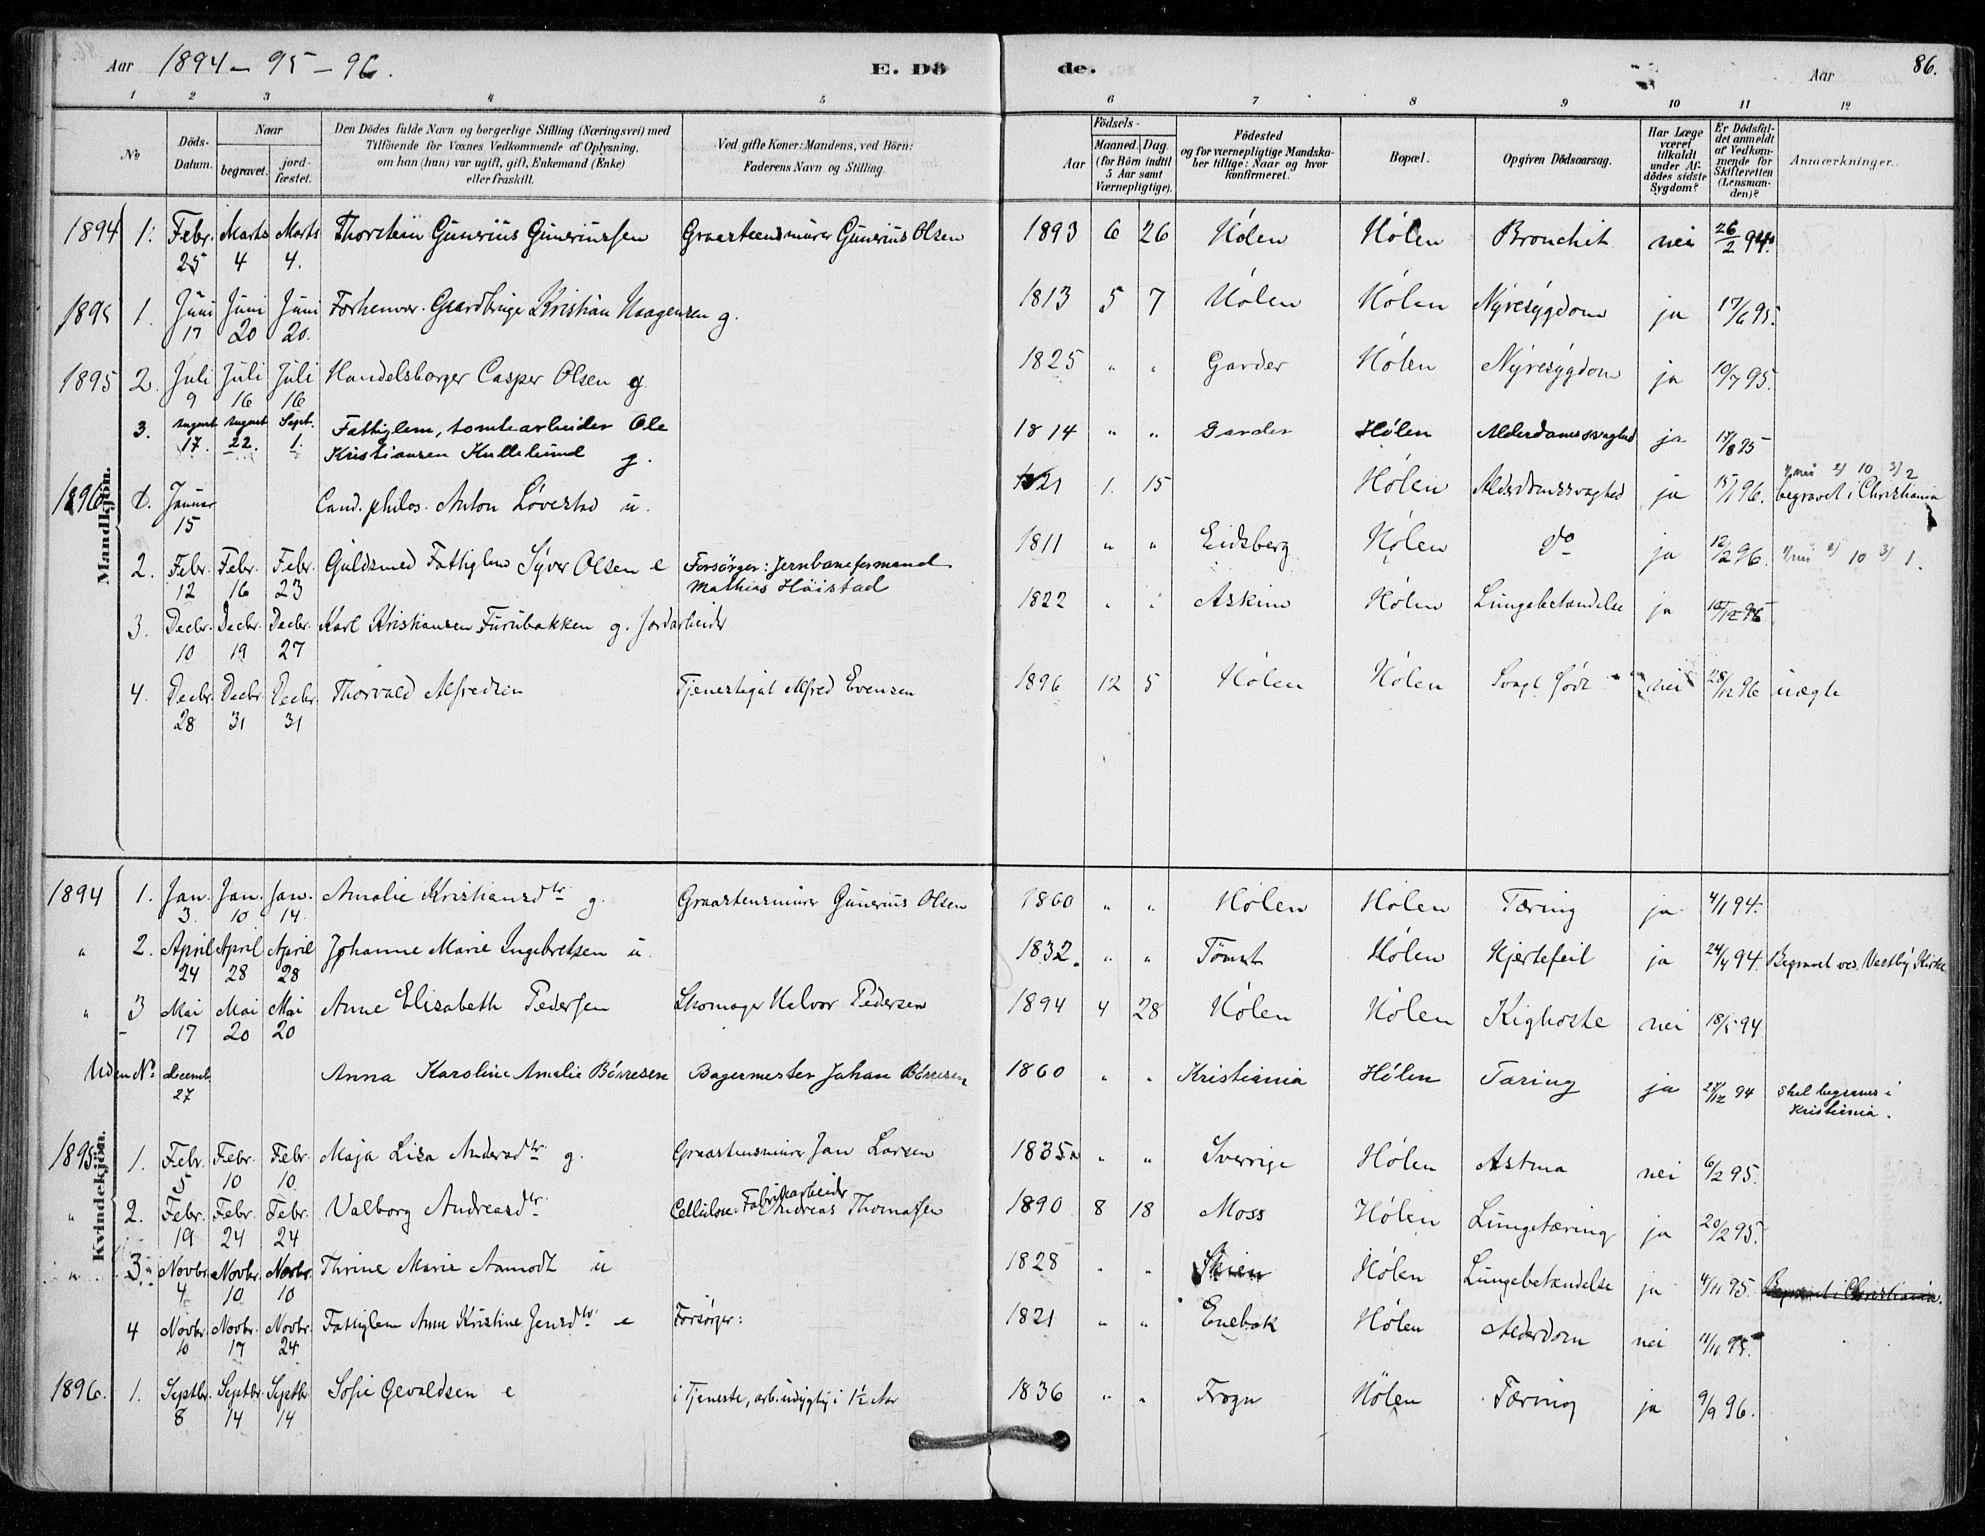 SAO, Vestby prestekontor Kirkebøker, F/Fe/L0001: Ministerialbok nr. V 1, 1878-1931, s. 86